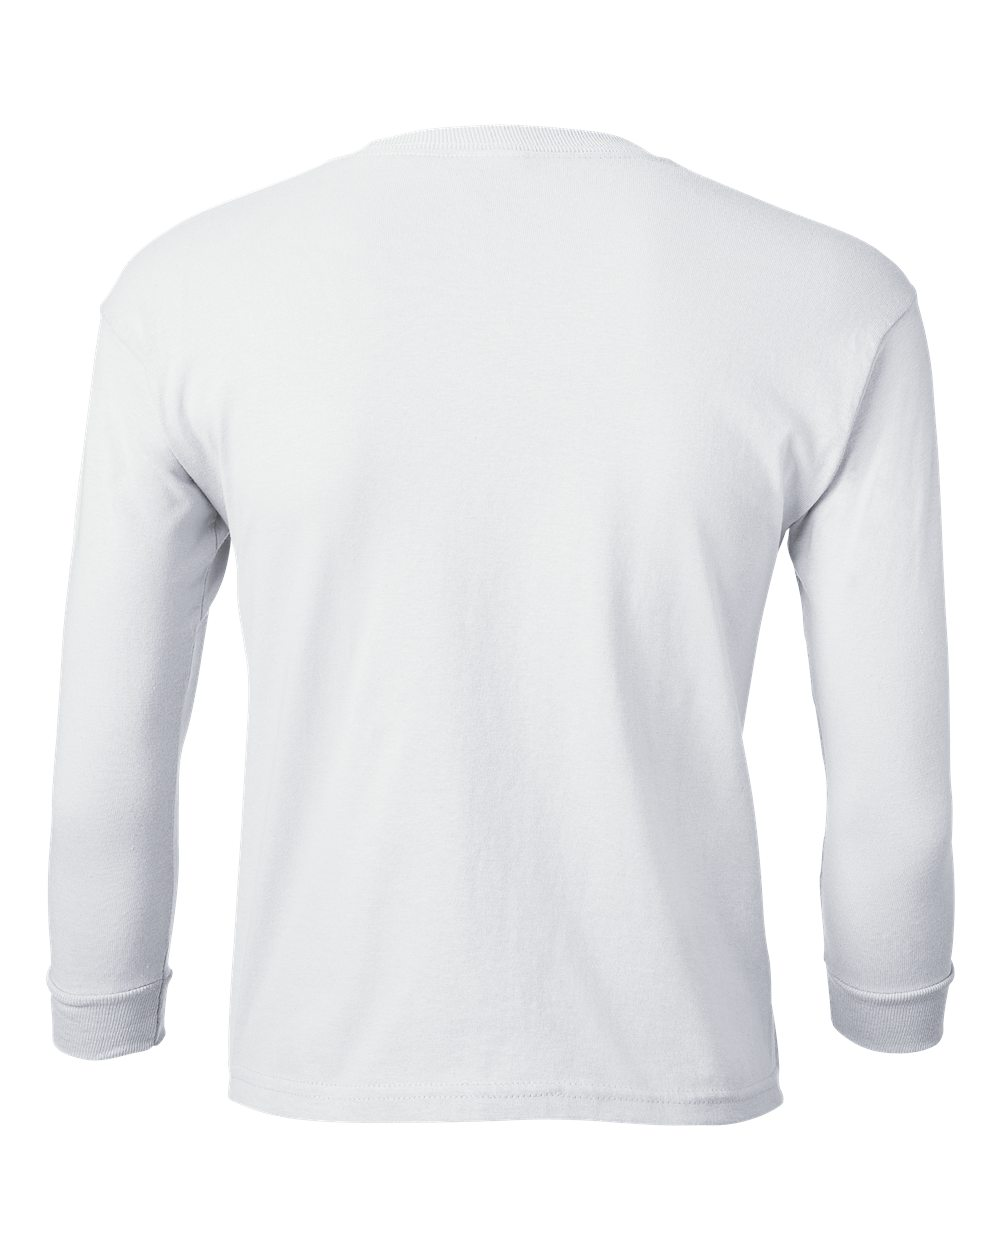 Gildan 100 ultra cotton long sleeve youth t shirt shirt for White cotton long sleeve t shirt